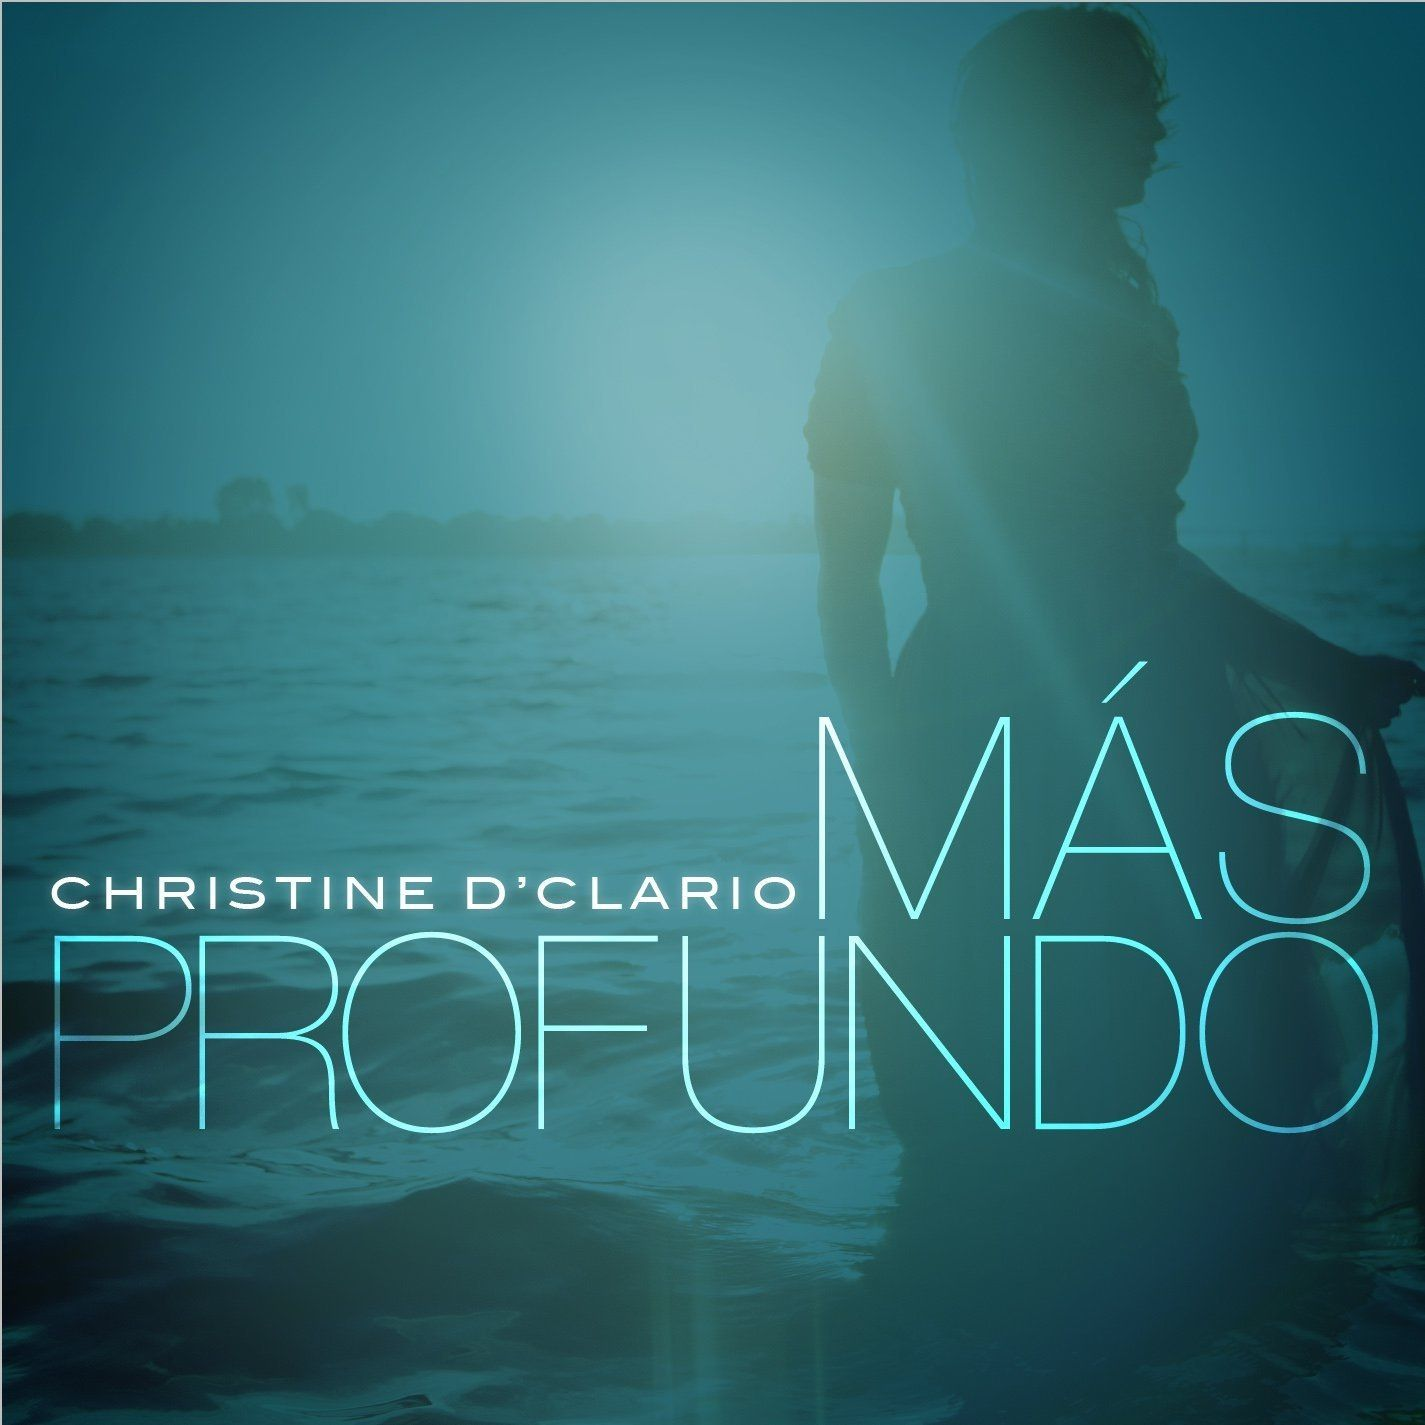 Christine D'Clario, álbum Más profundo